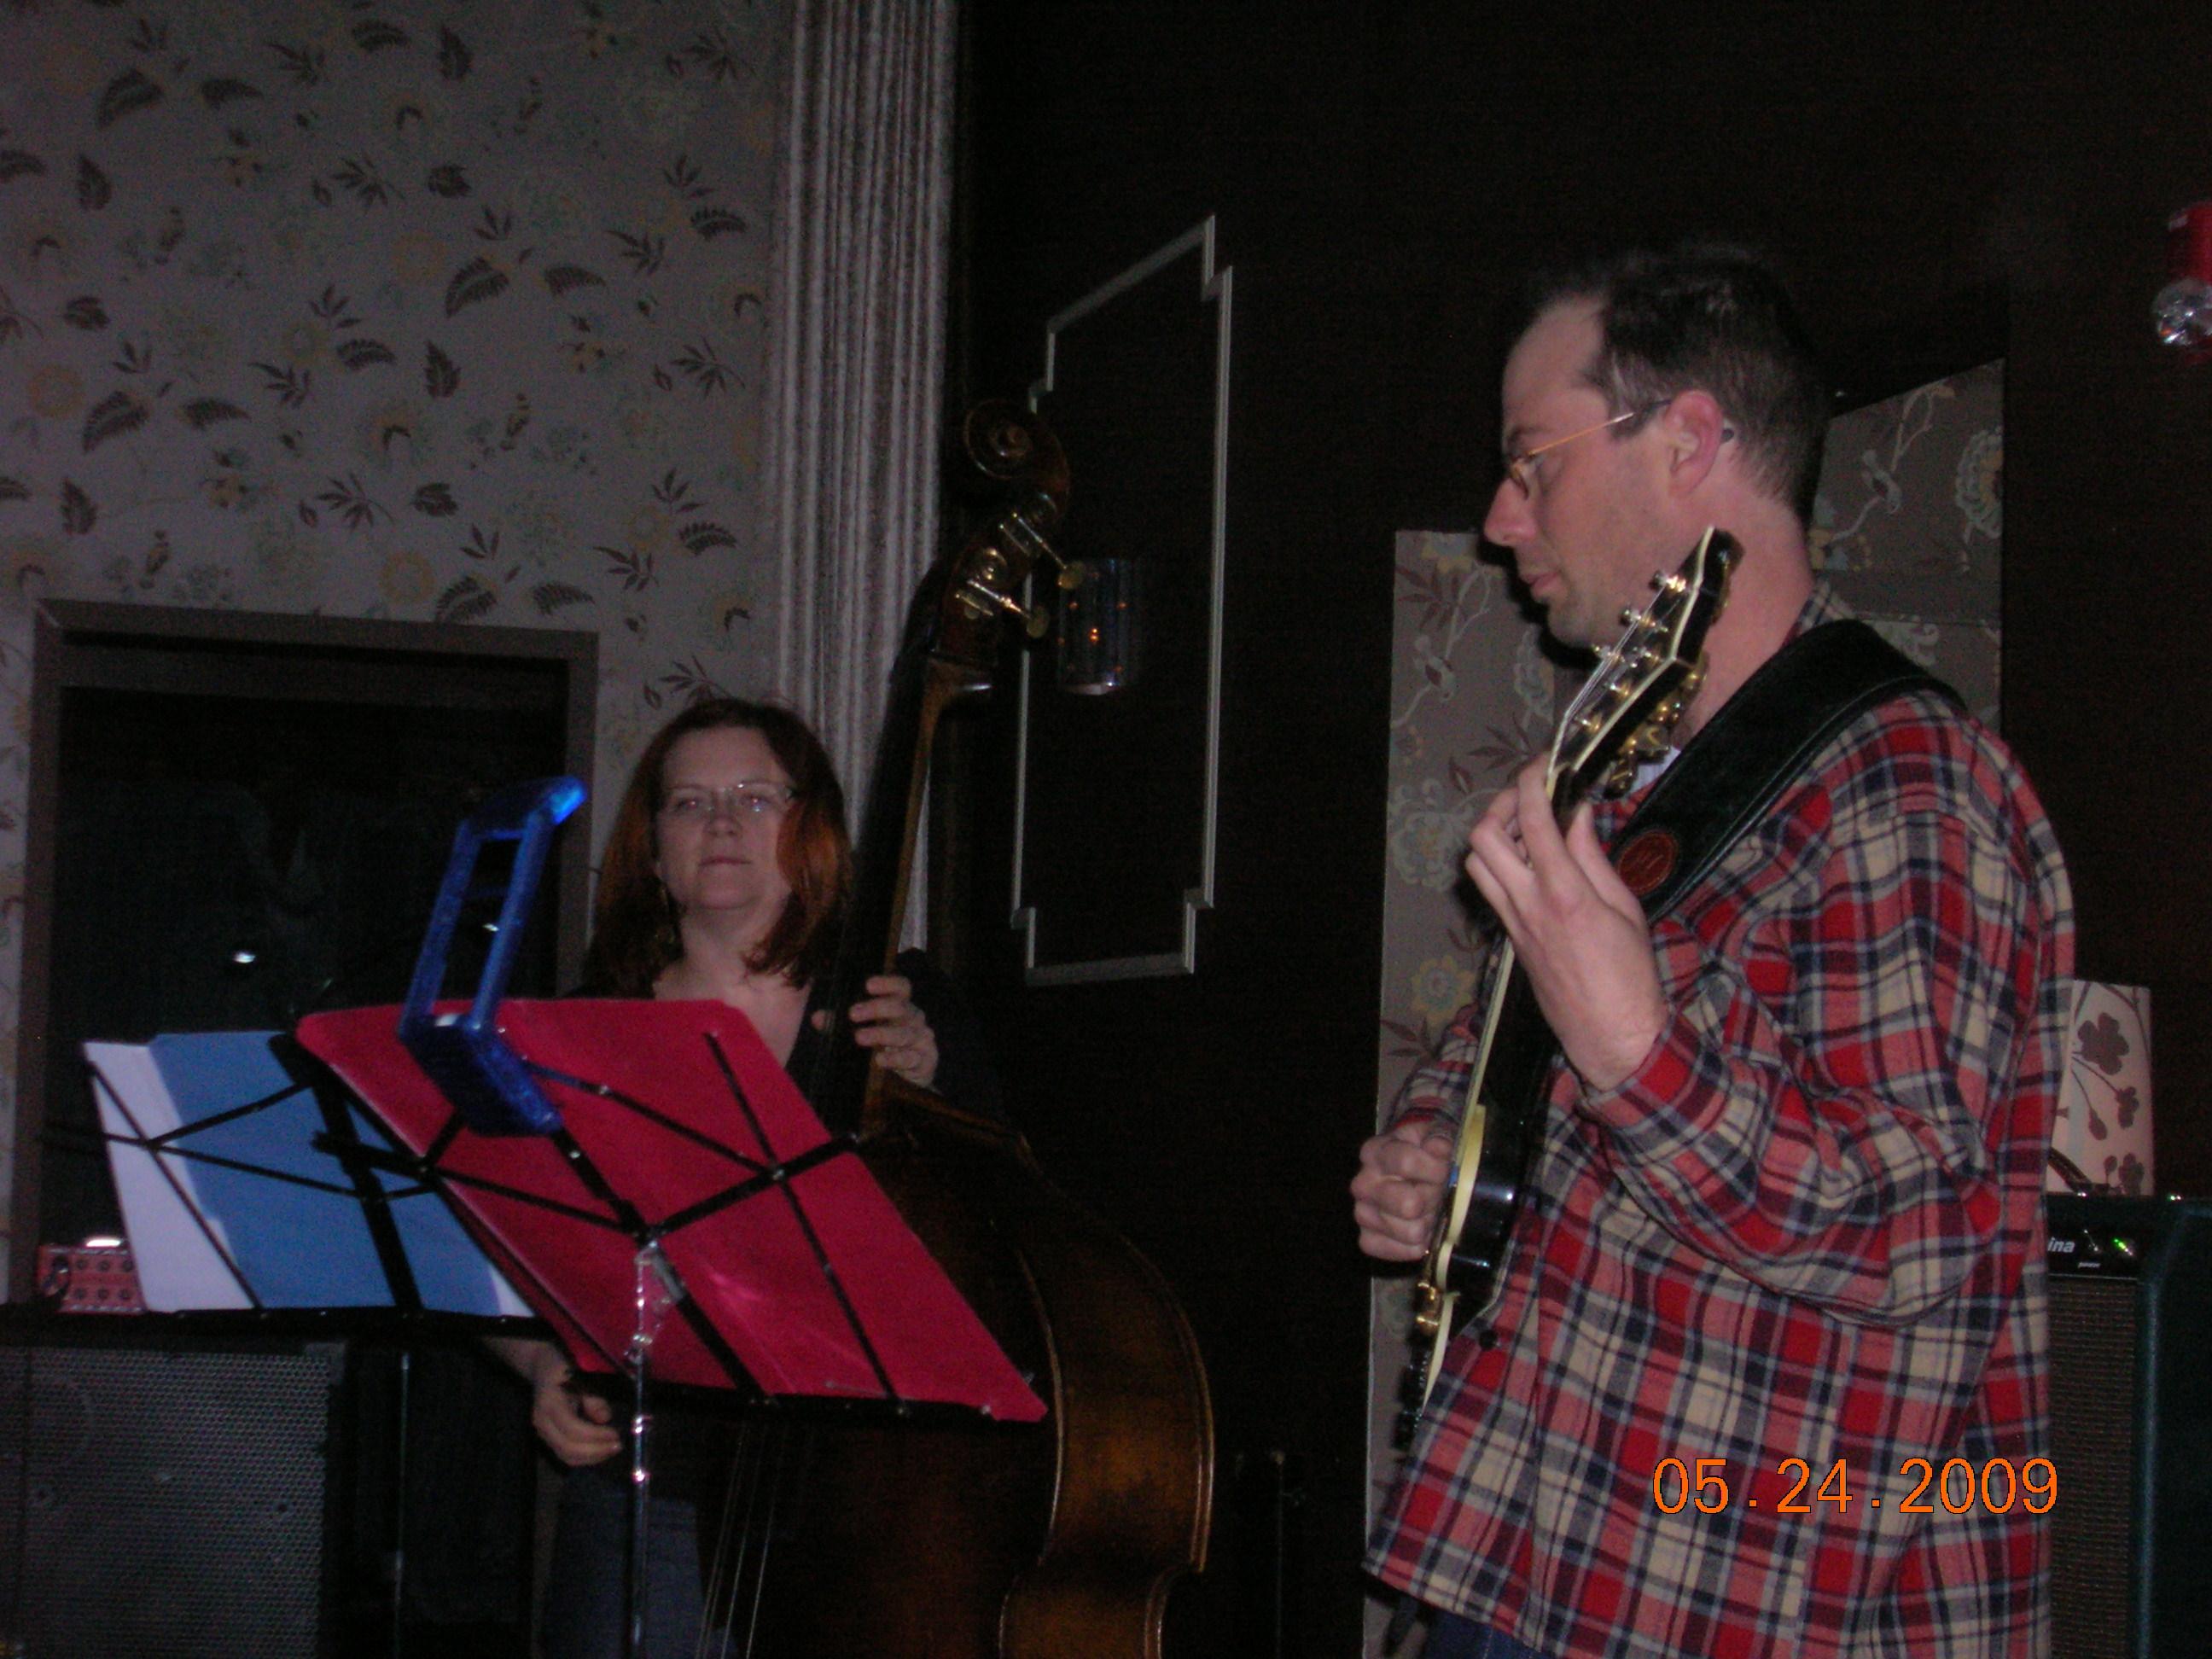 Lisa Mezzacappa, John Finkbeiner - Ivy Room, May 2009